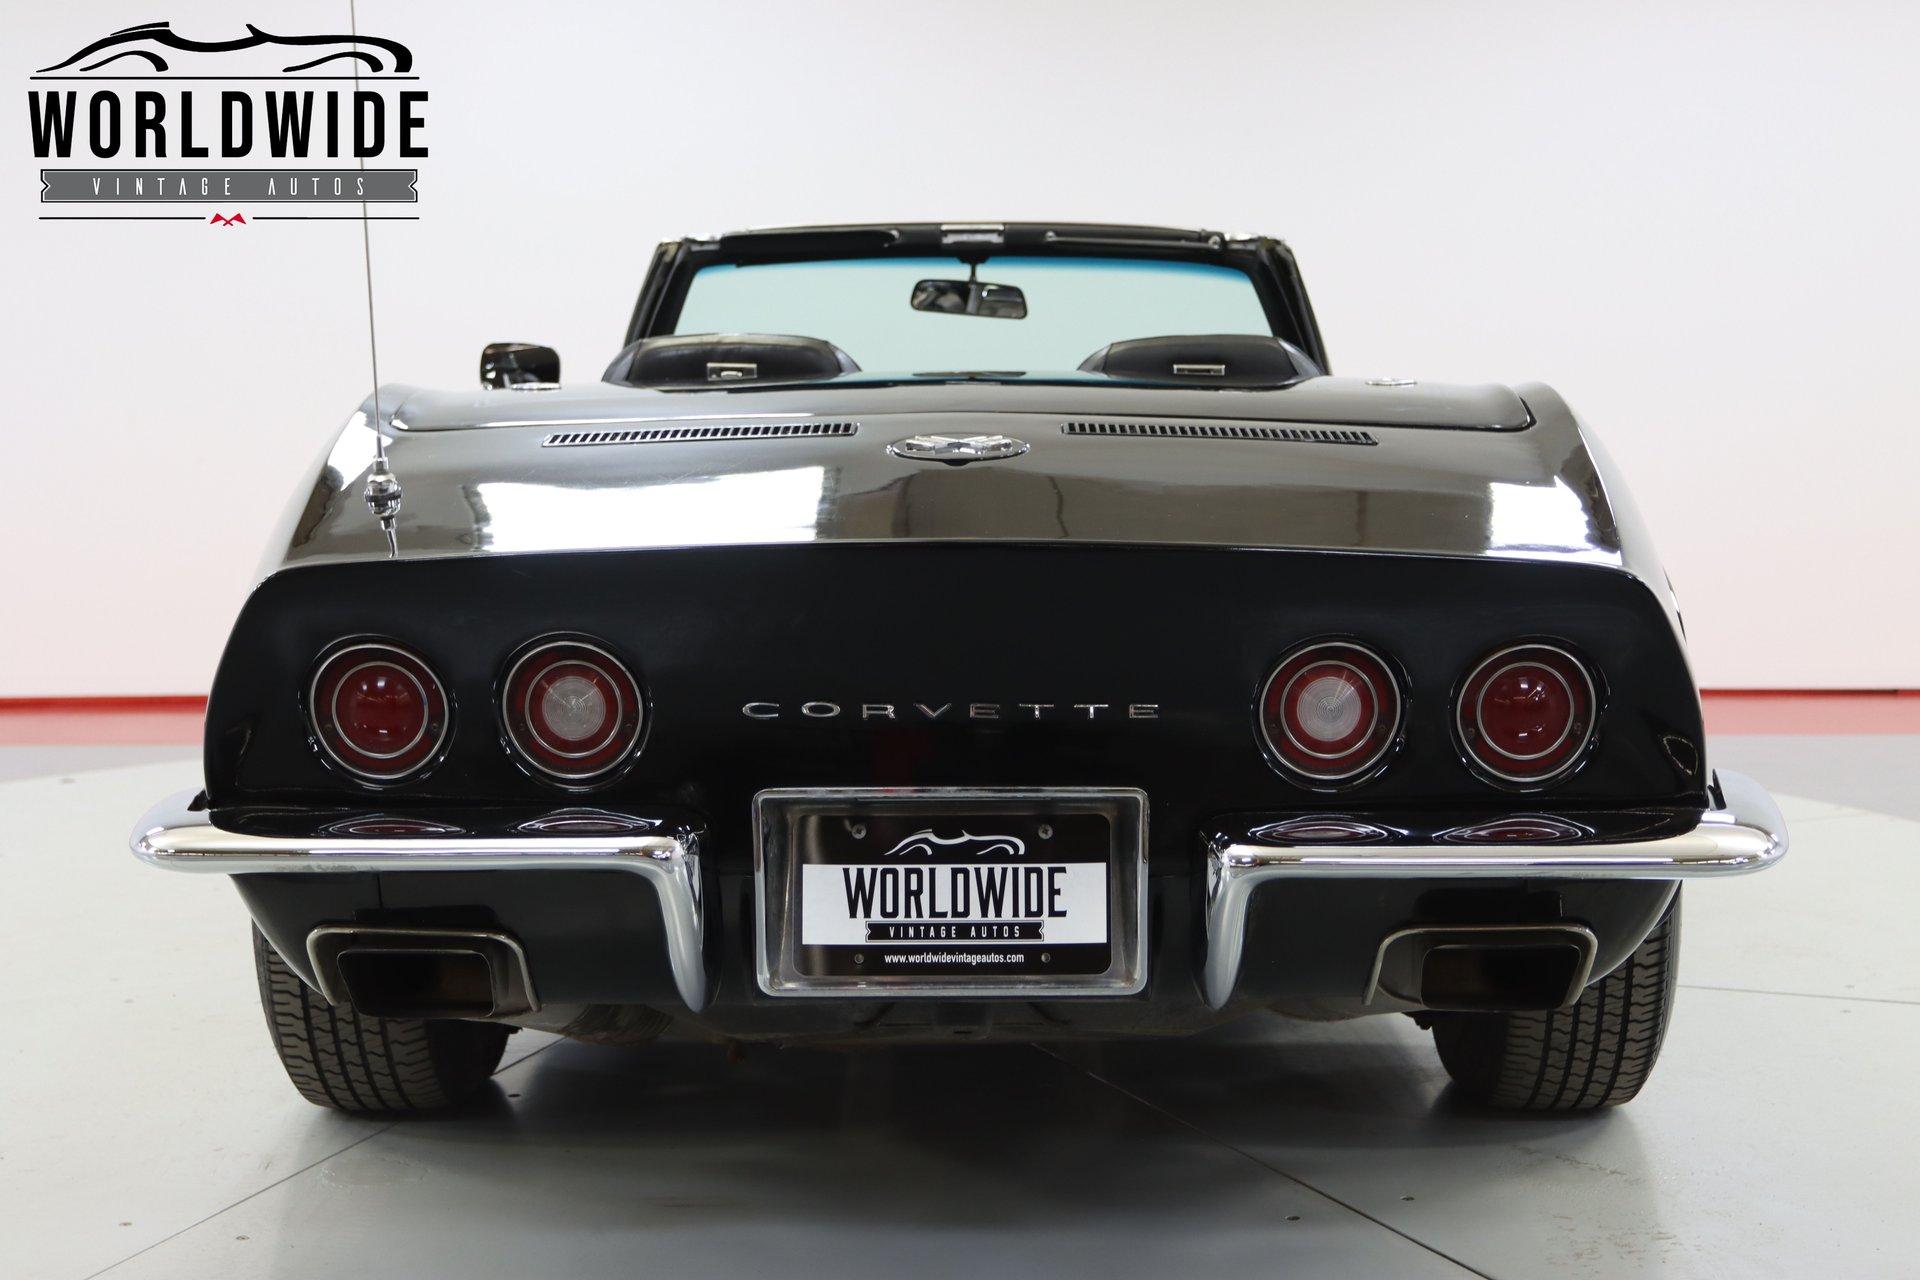 1972 Chevrolet Corvette Convertible